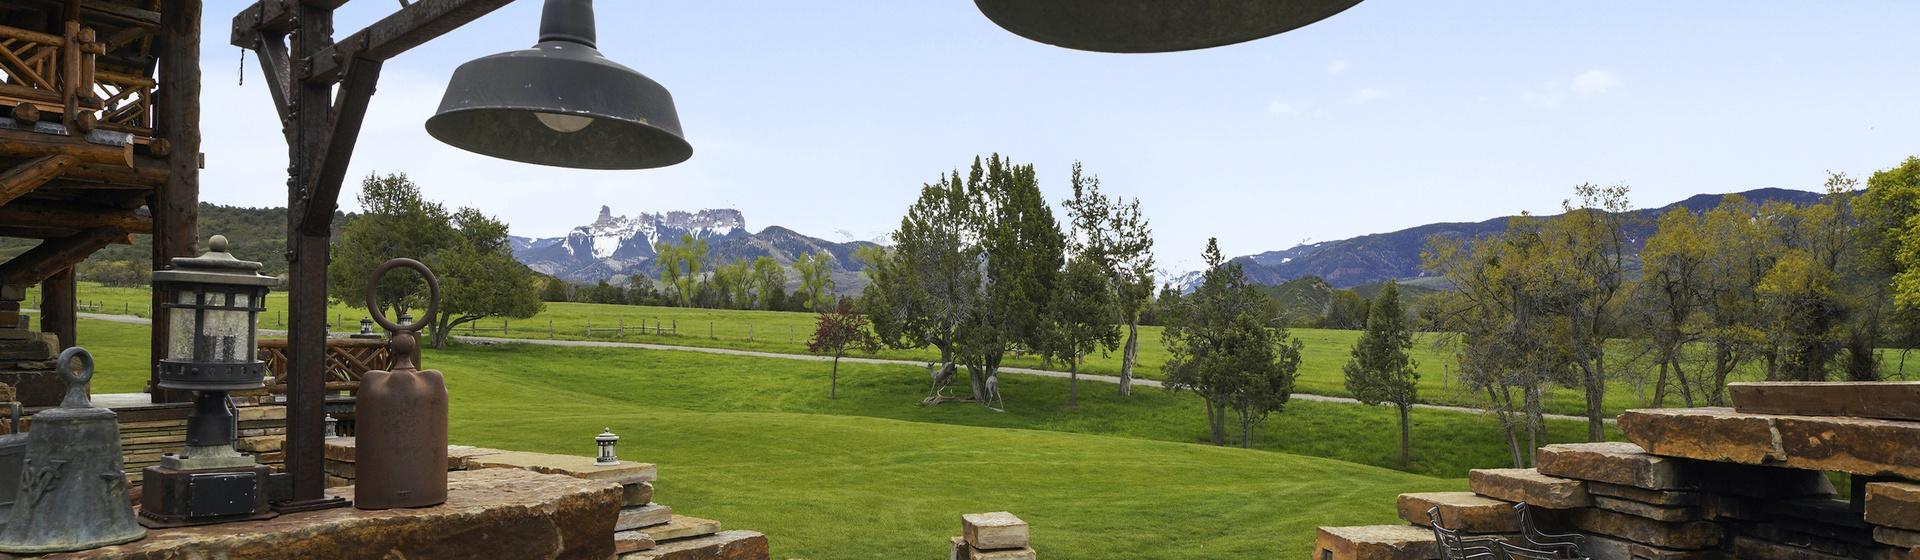 12.4-Telluride-Sleeping-Indian-Ranch-stone-terrace-overlook-web.JPG